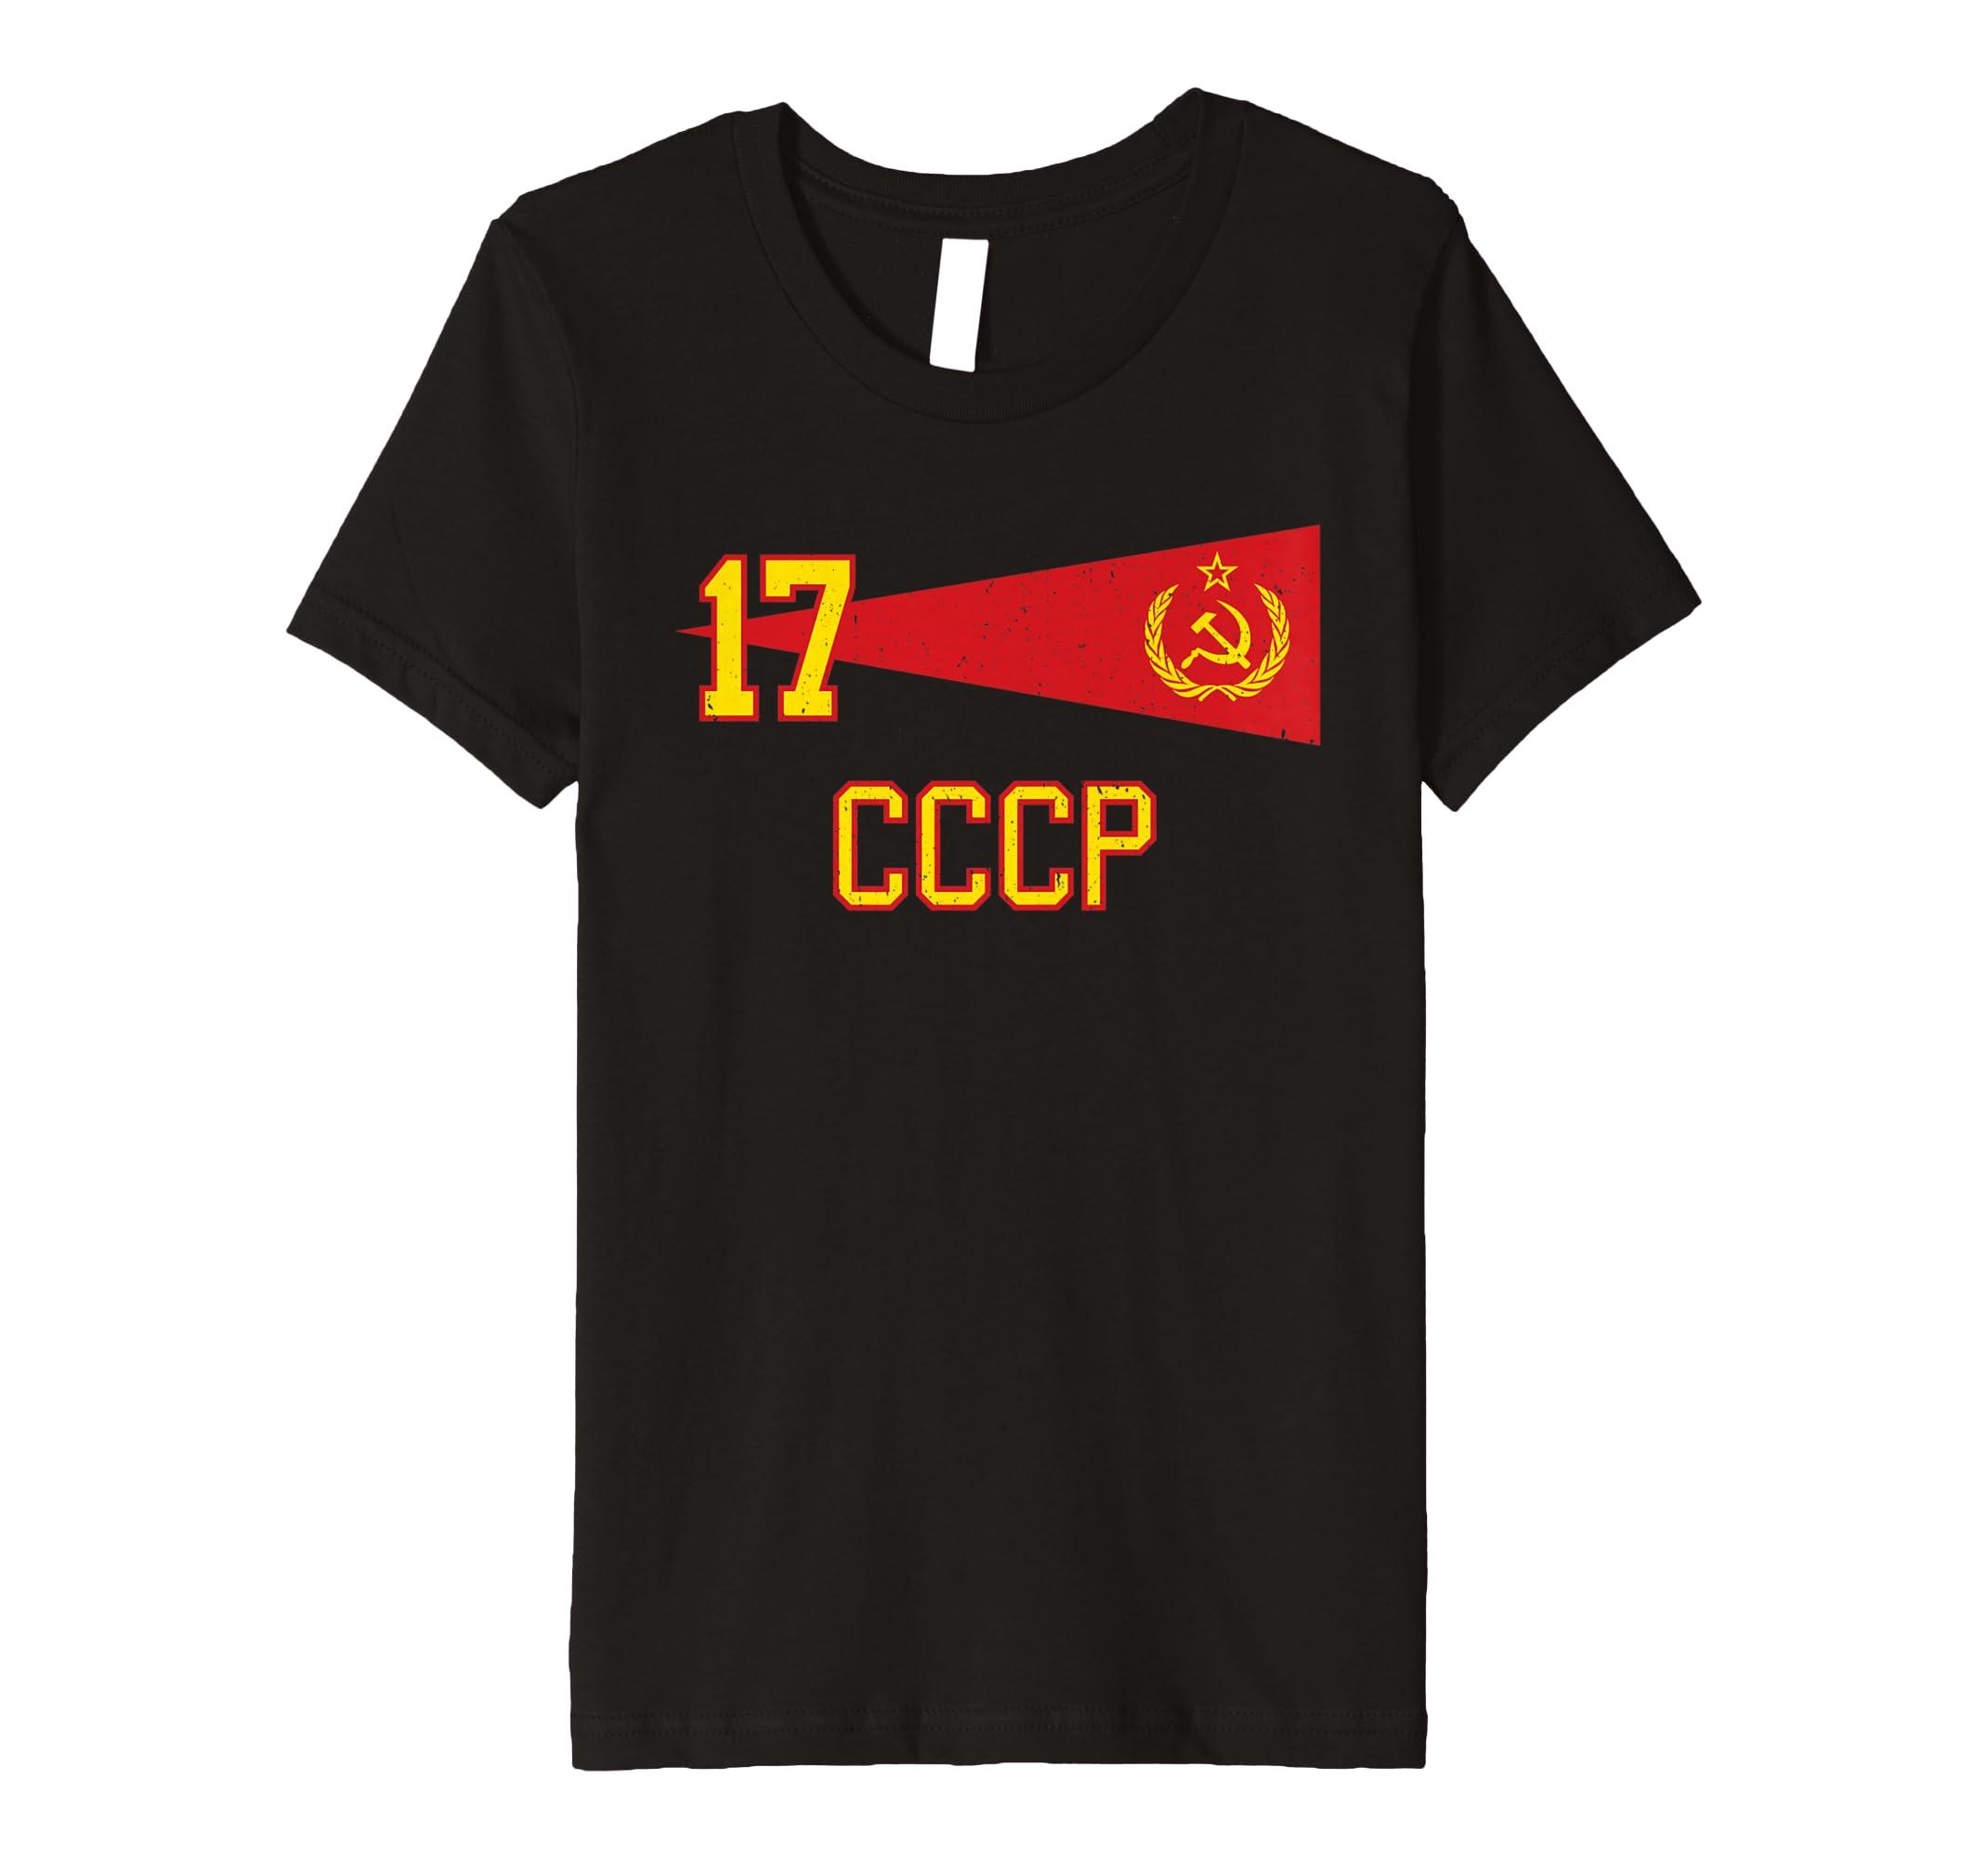 brand new 5dfe6 e6332 Retro Soviet Union Soccer Jersey CCCP Football Tee USSR 17